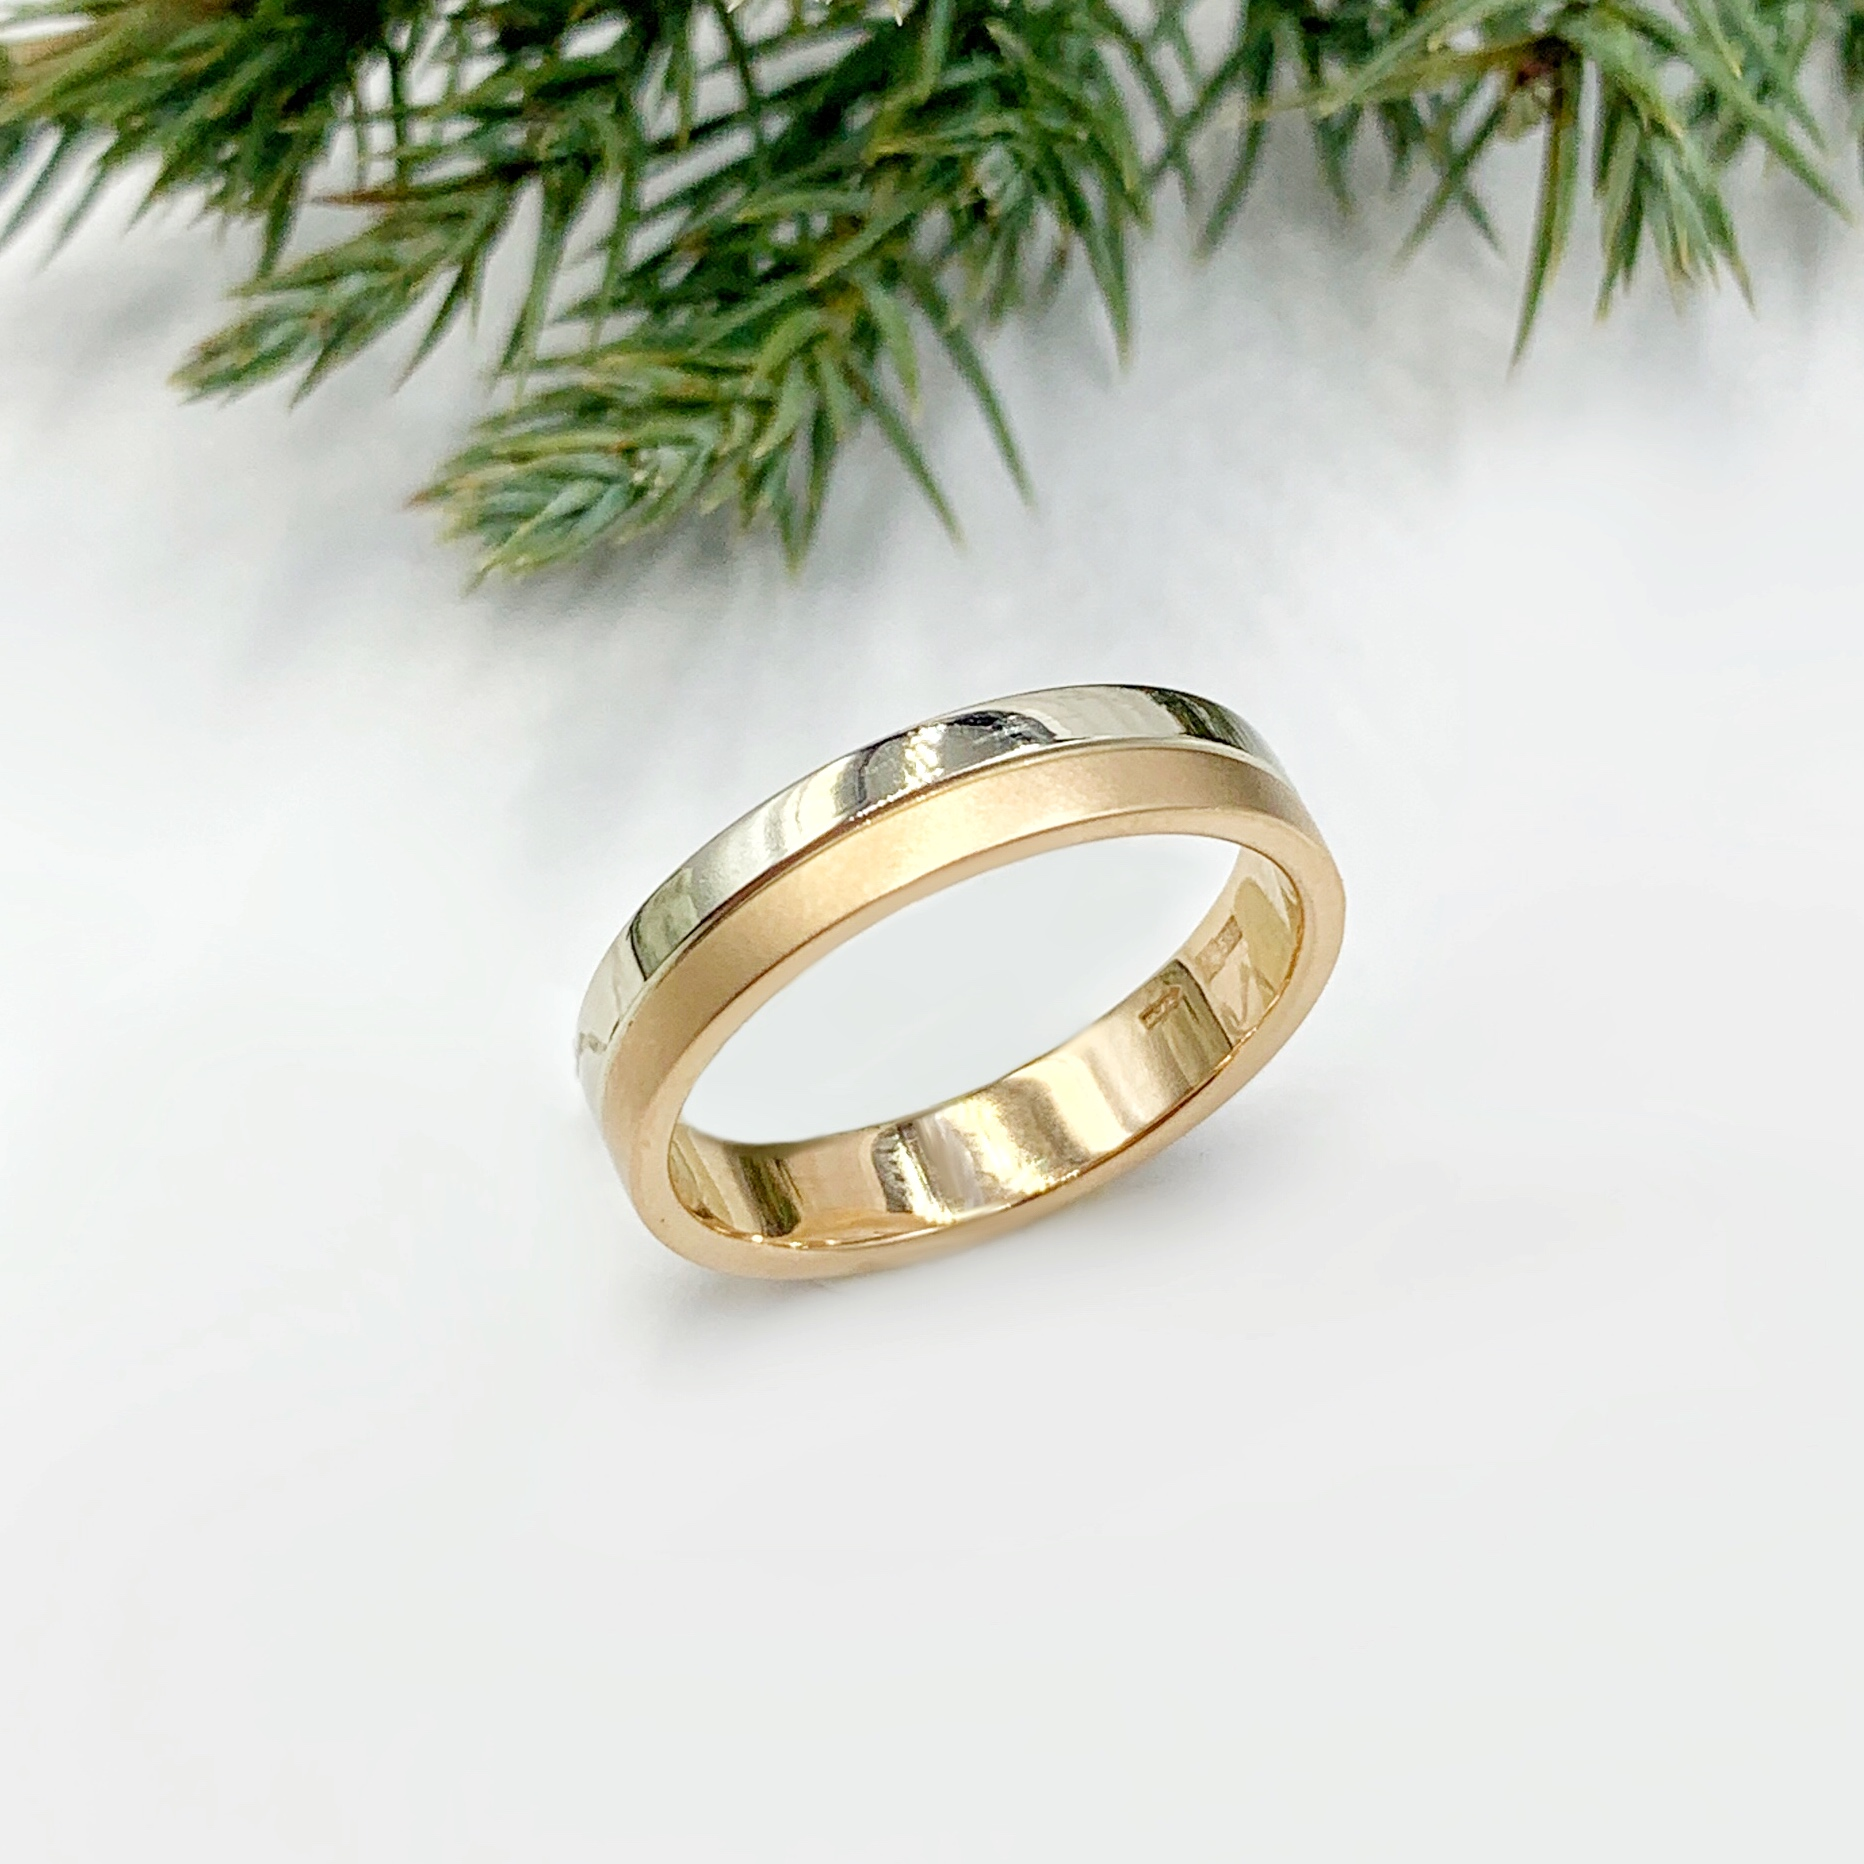 Золота обручка з білим золотом